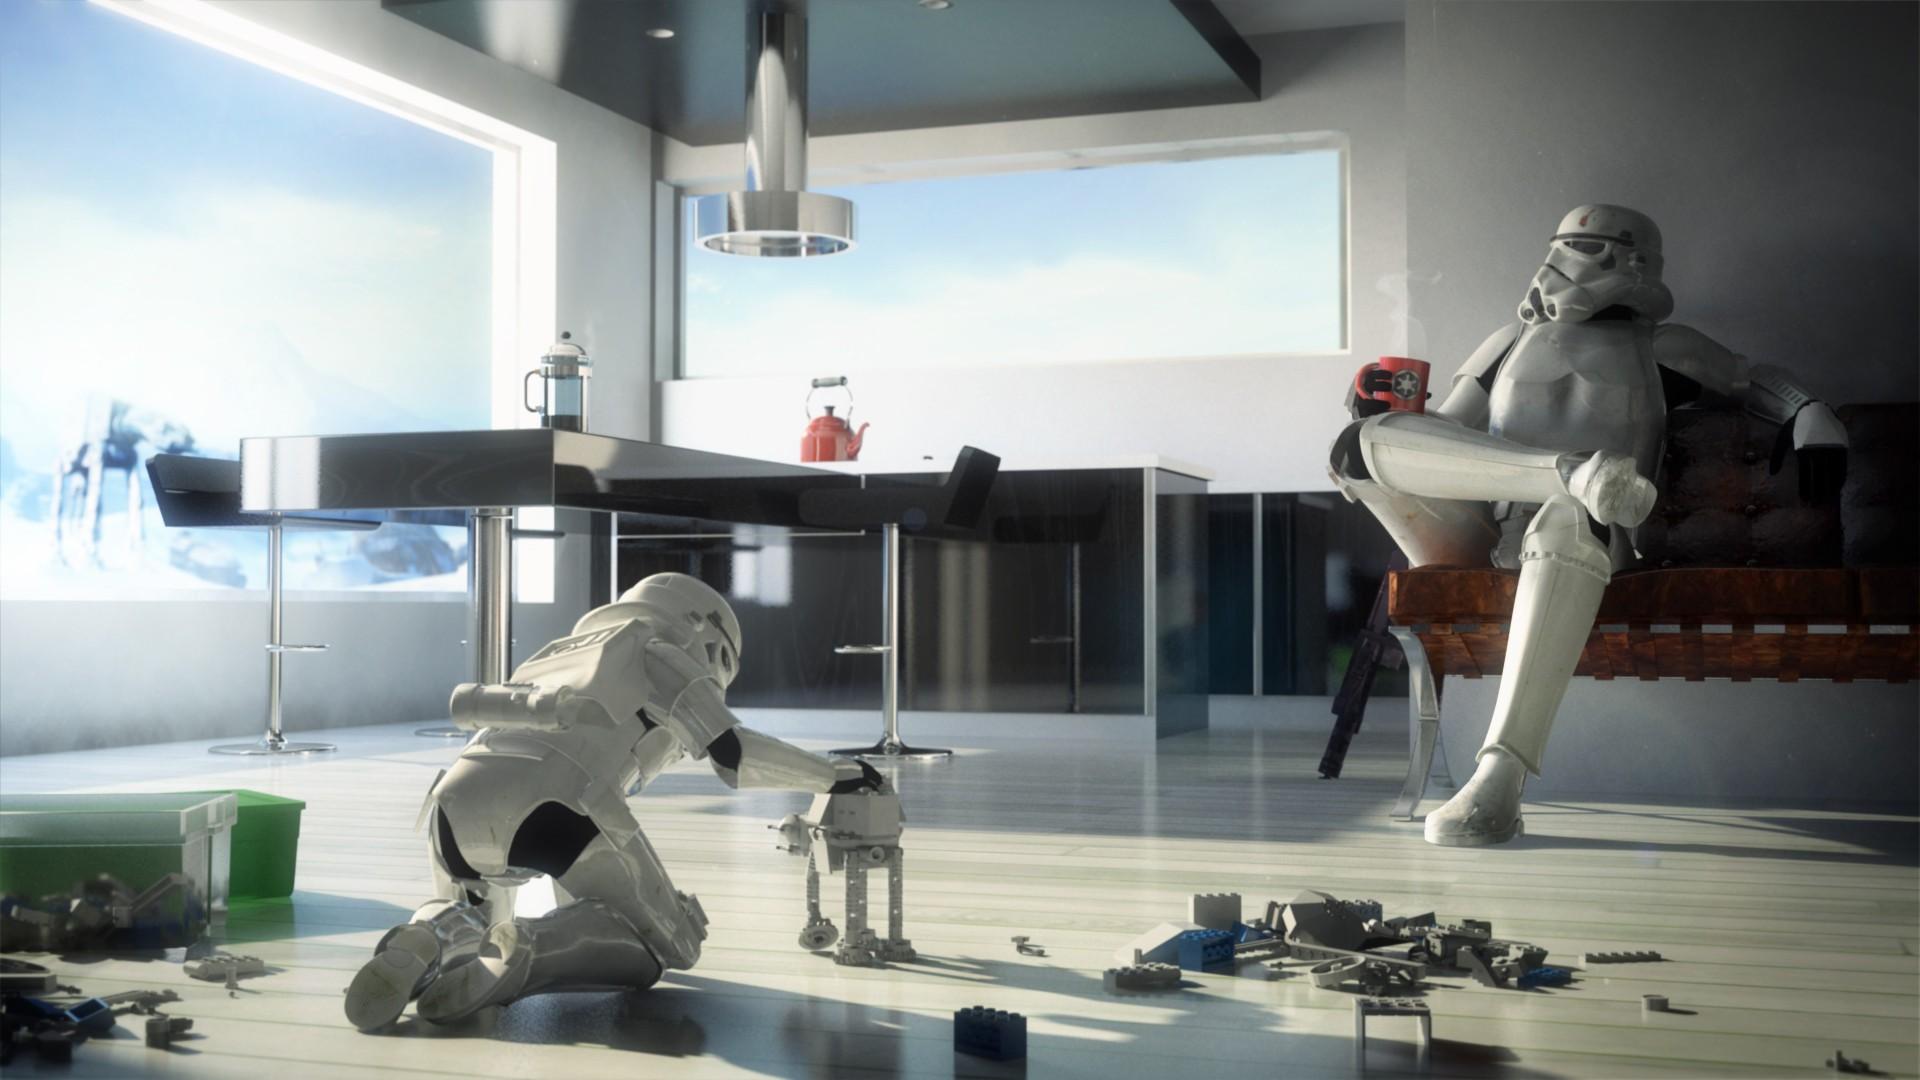 General 1920x1080 Star Wars stormtrooper children humor digital art artwork LEGO toys